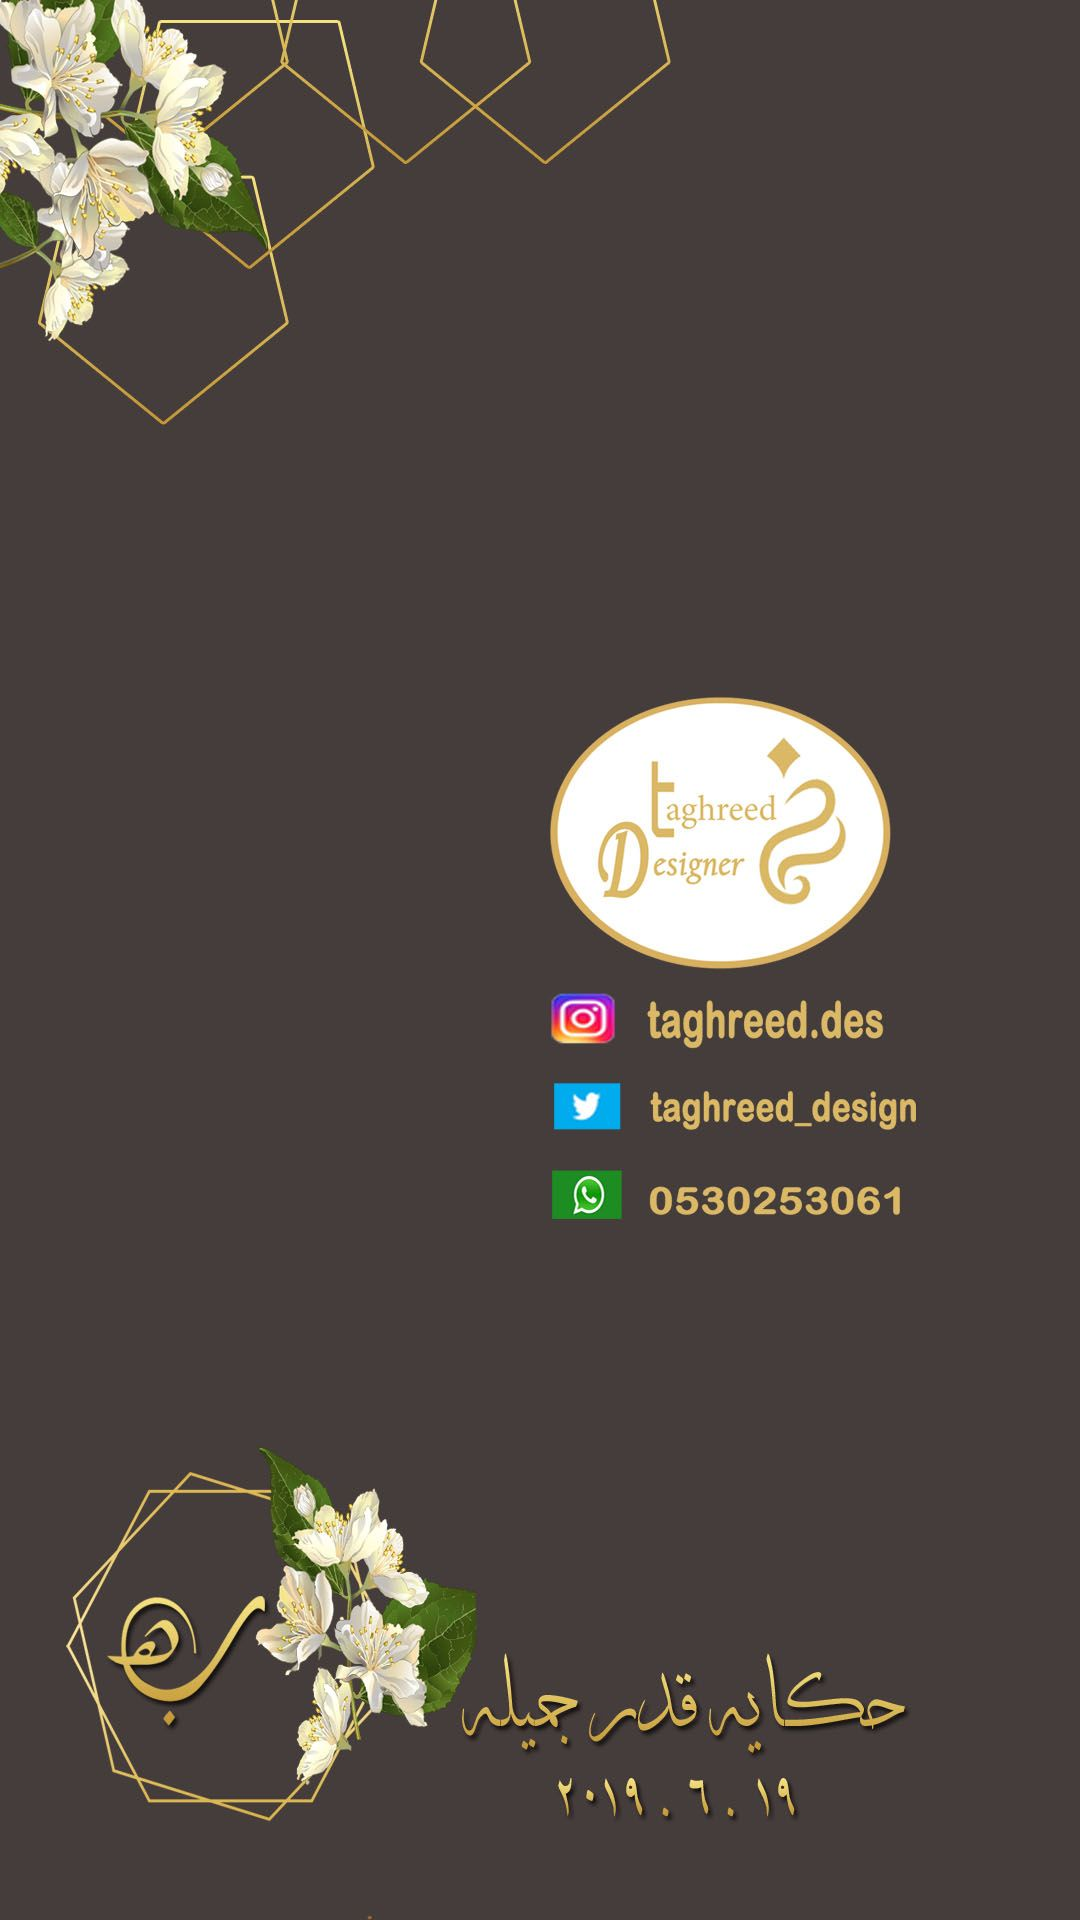 فلتر زواج Popular Wedding Invitations Wedding Invitations Mobile Wallpaper